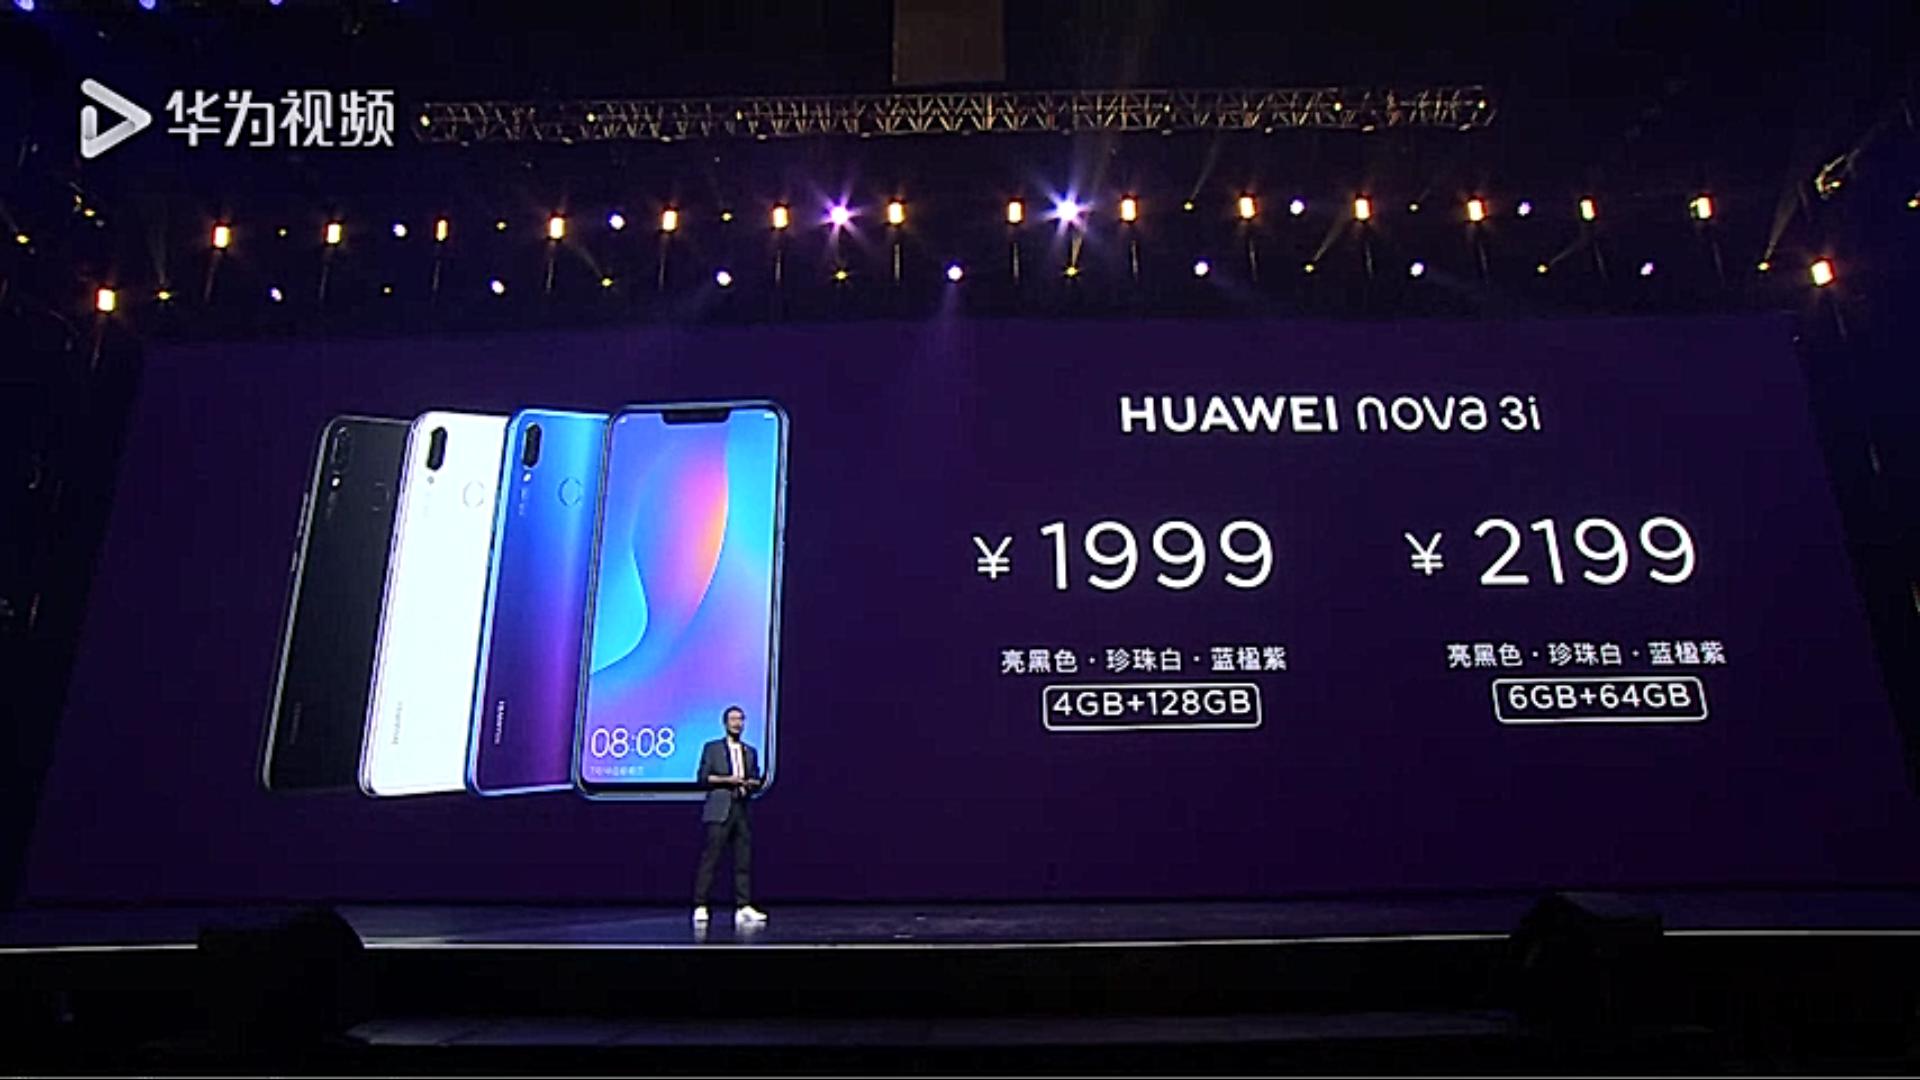 Huawei Nova 3和3i正式发布!全新处理器、GPU Turbo、3D Qmoji、4x摄像头等,售价约RM1205起!